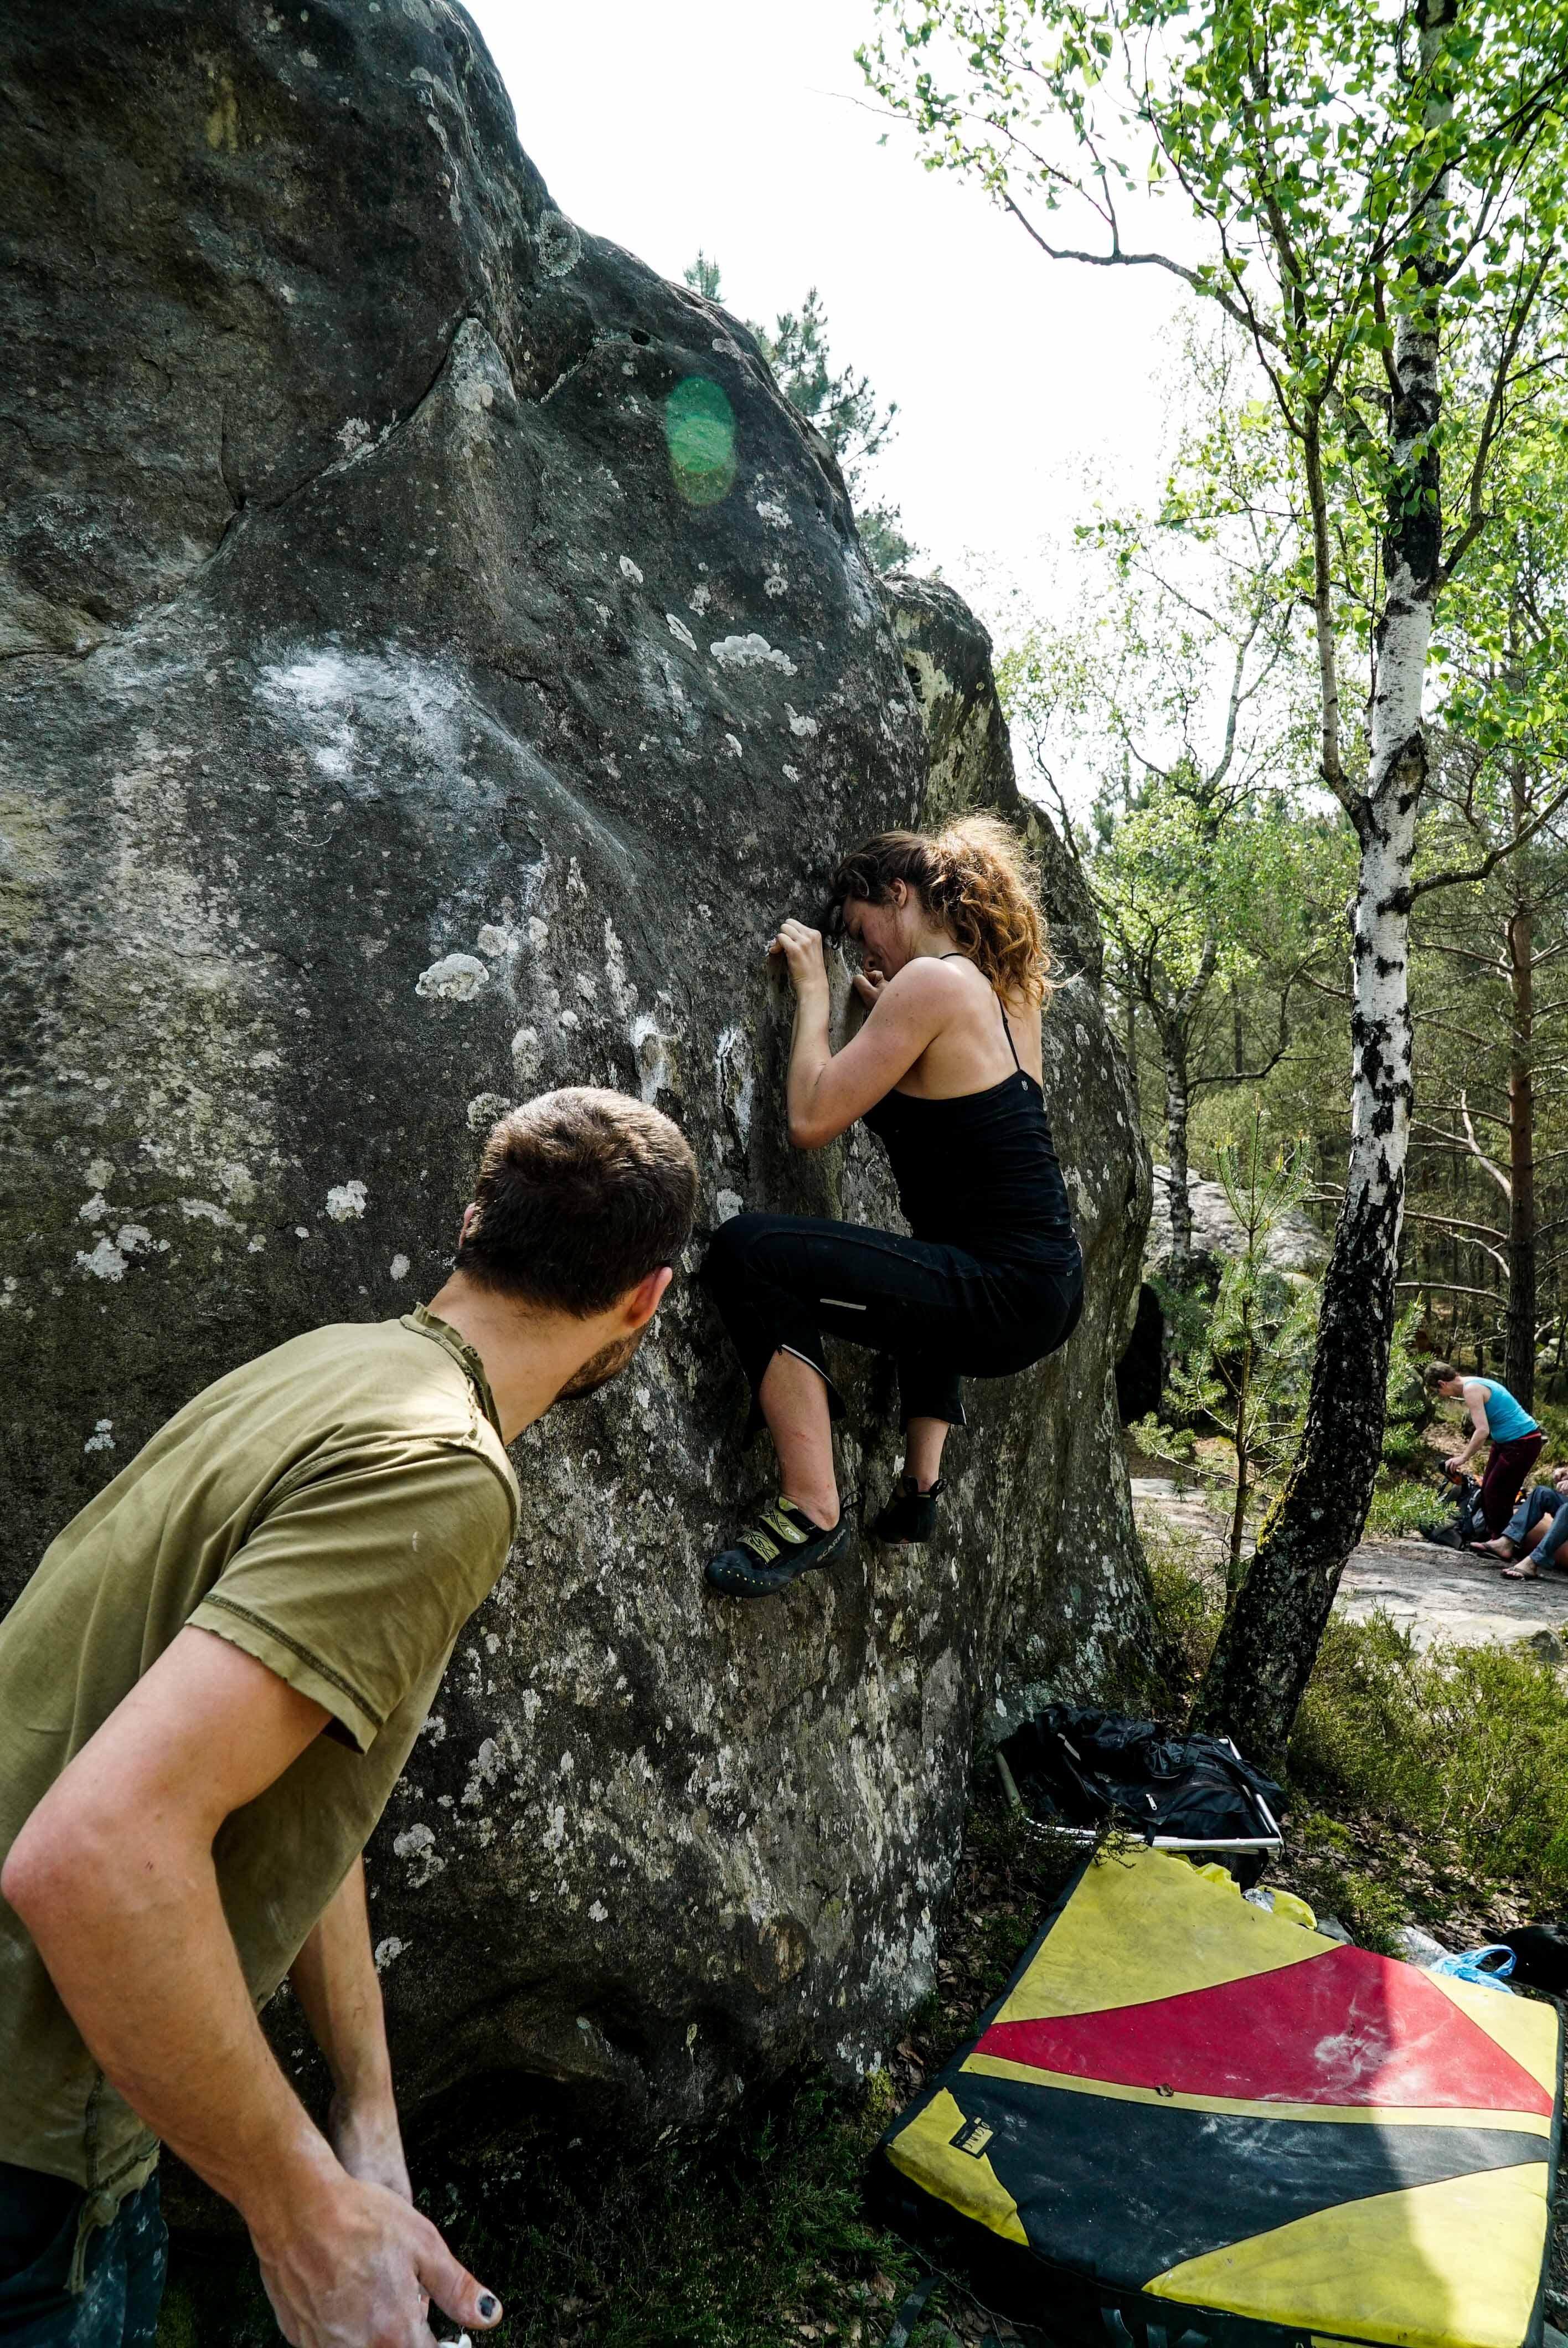 fontainbleau climbing 2016 mike brindley-79